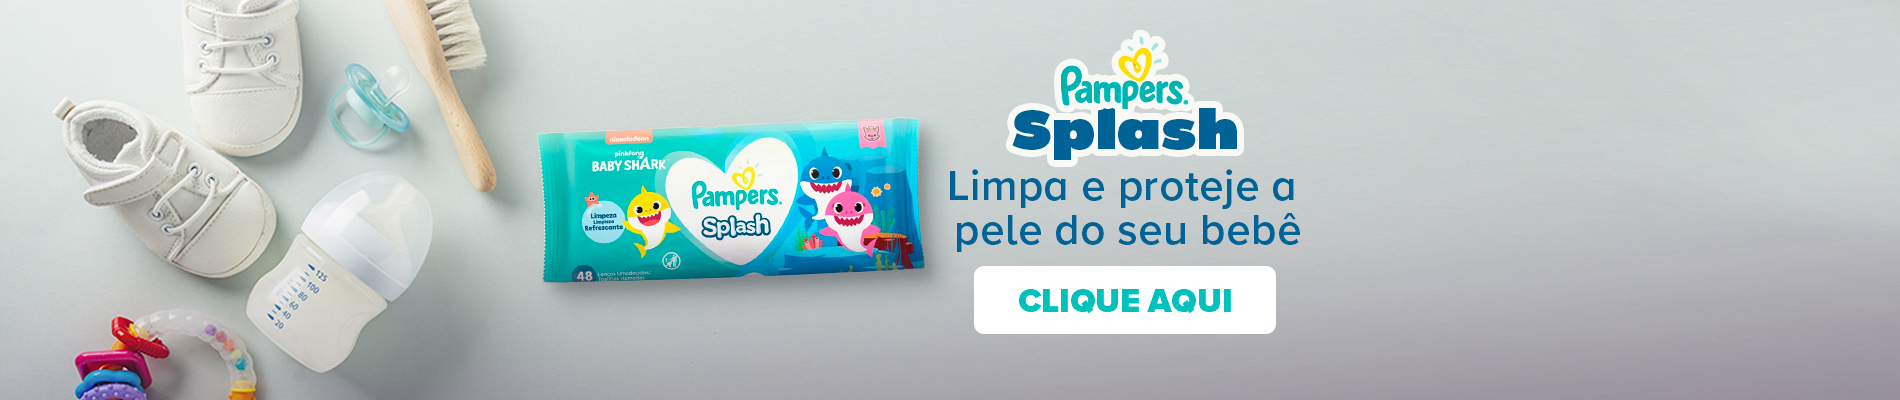 Pampers Spash